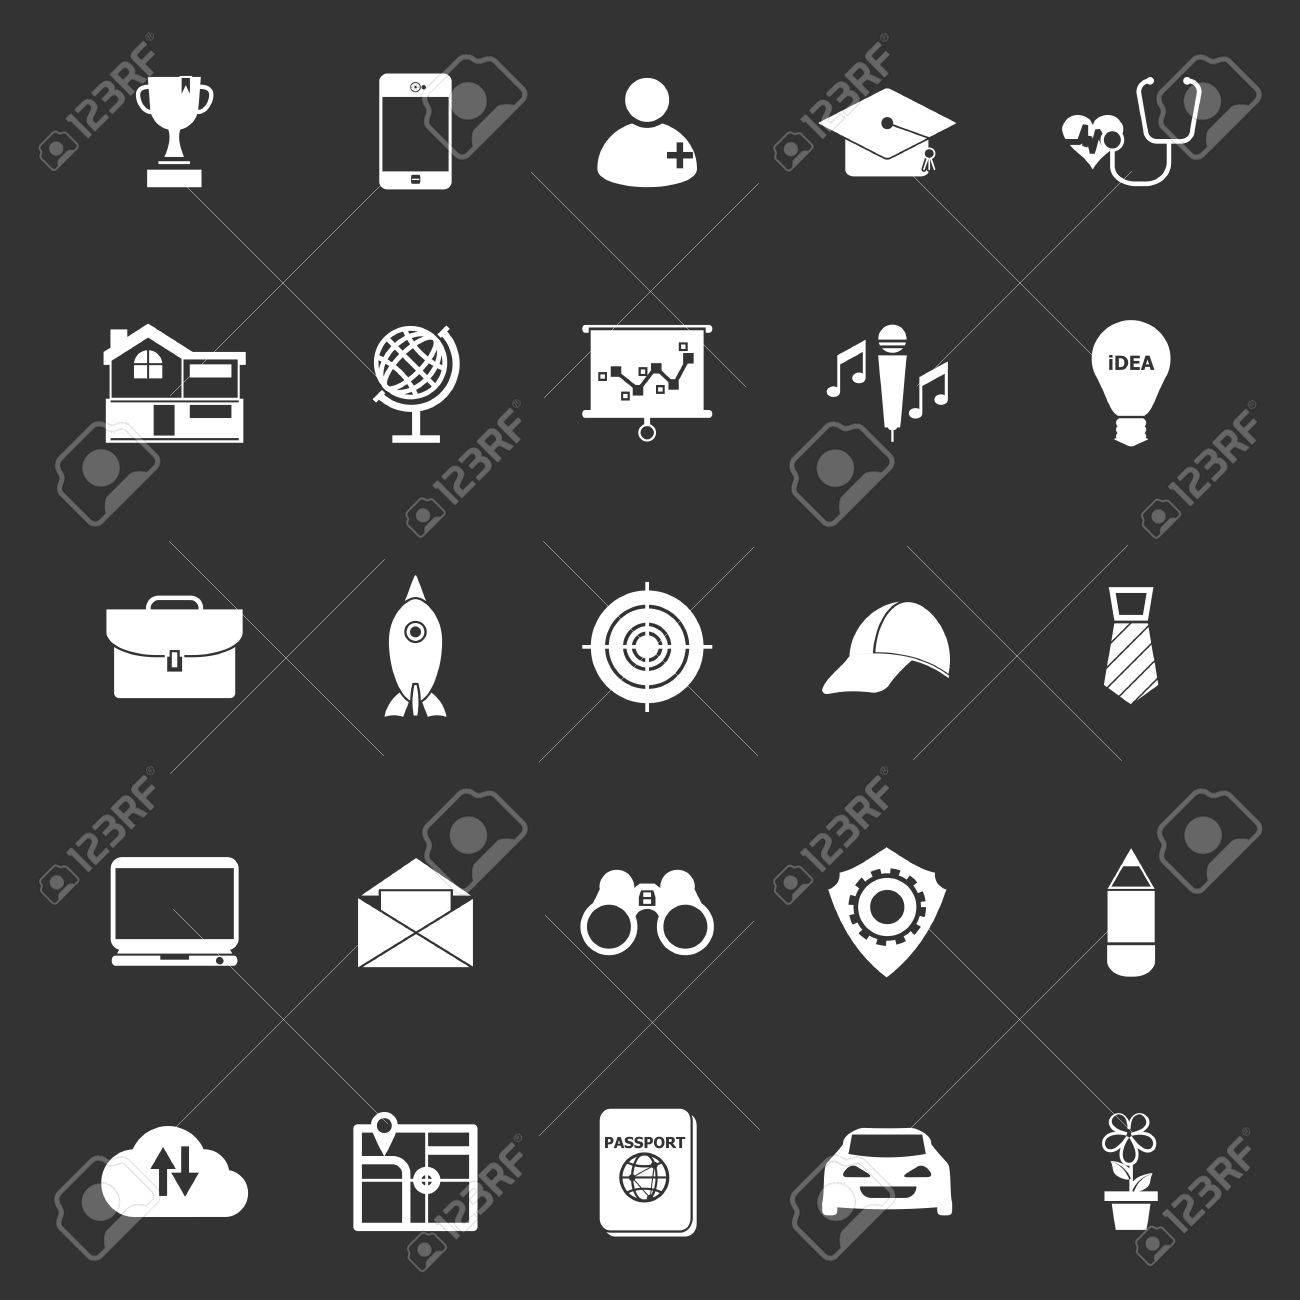 Job Description Icons On Gray Background, Stock Vector Stock Vector    42028045